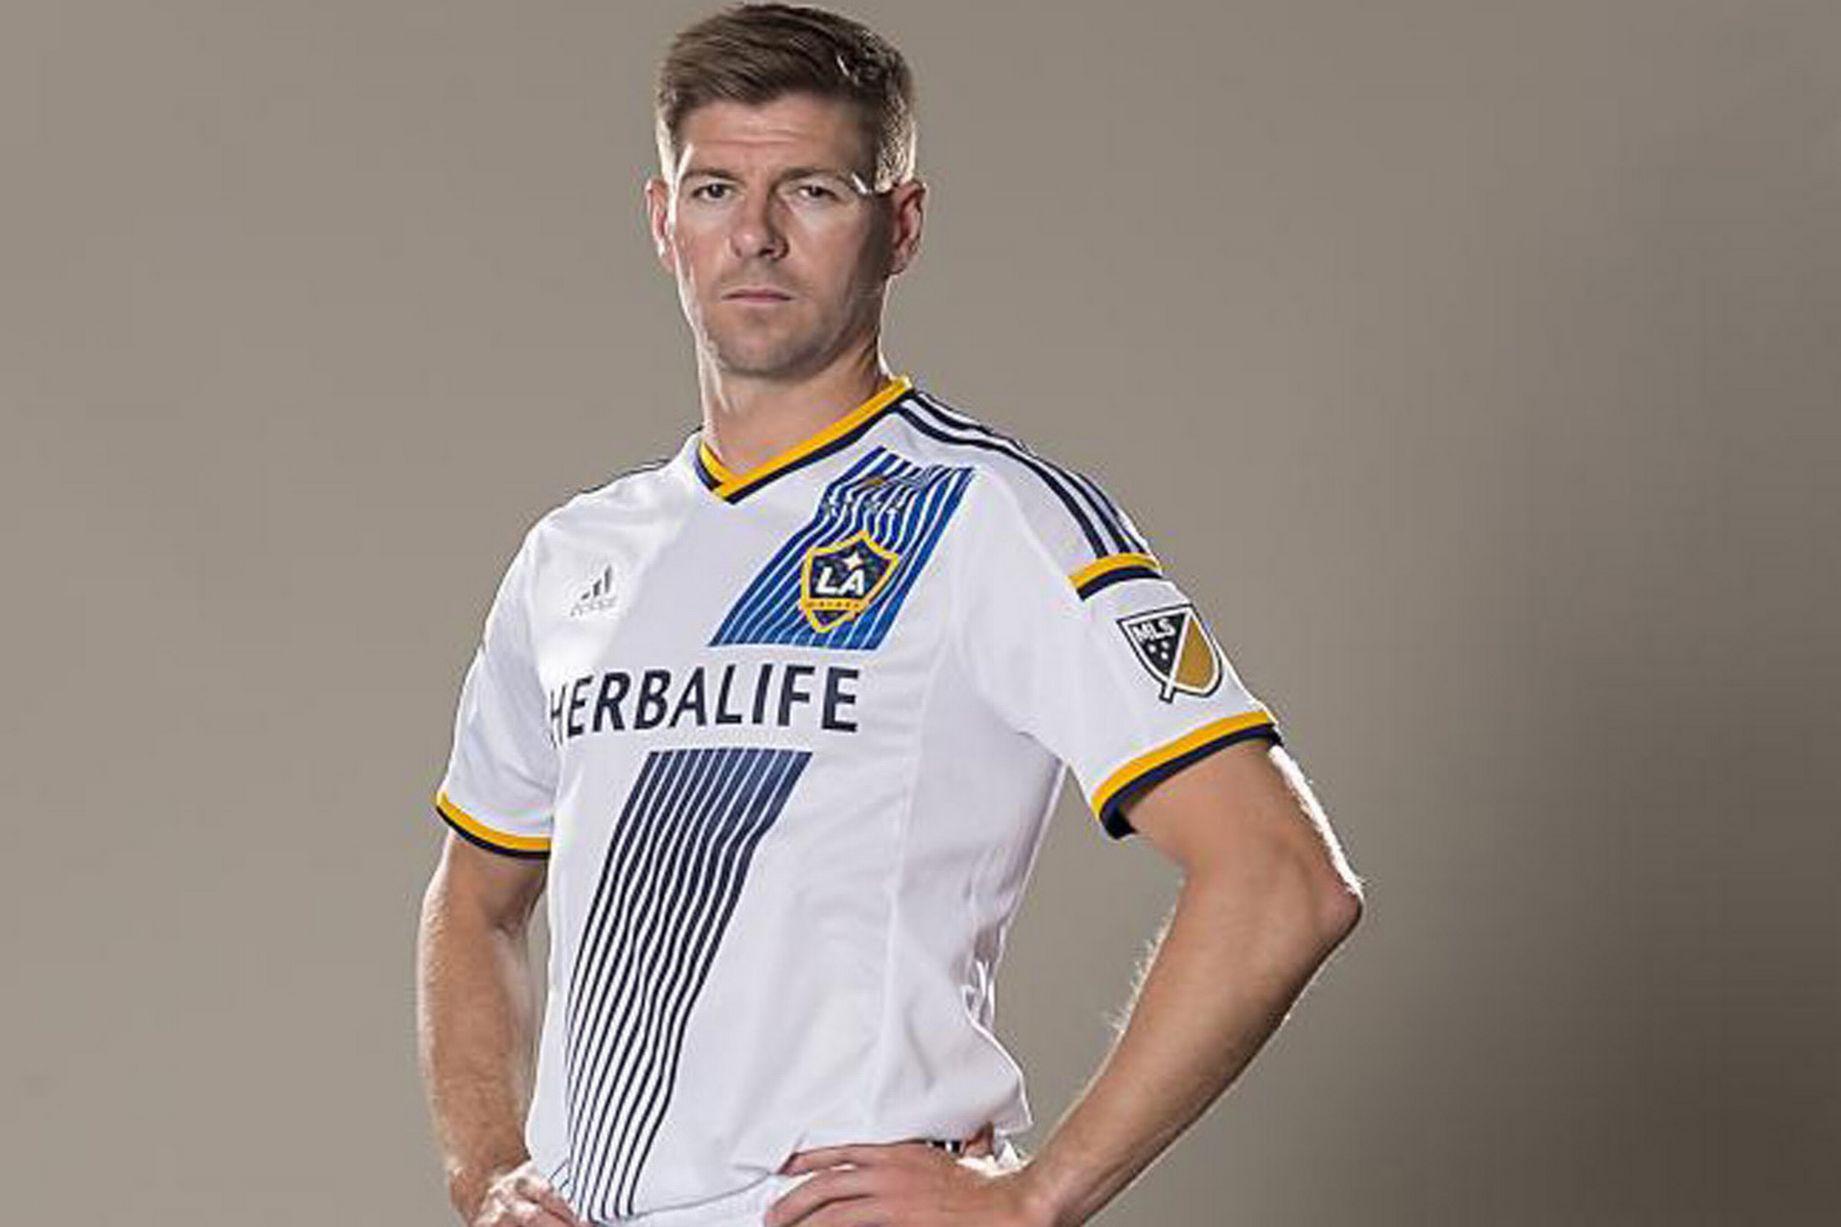 ' I Will Miss You LA' - Gerrard